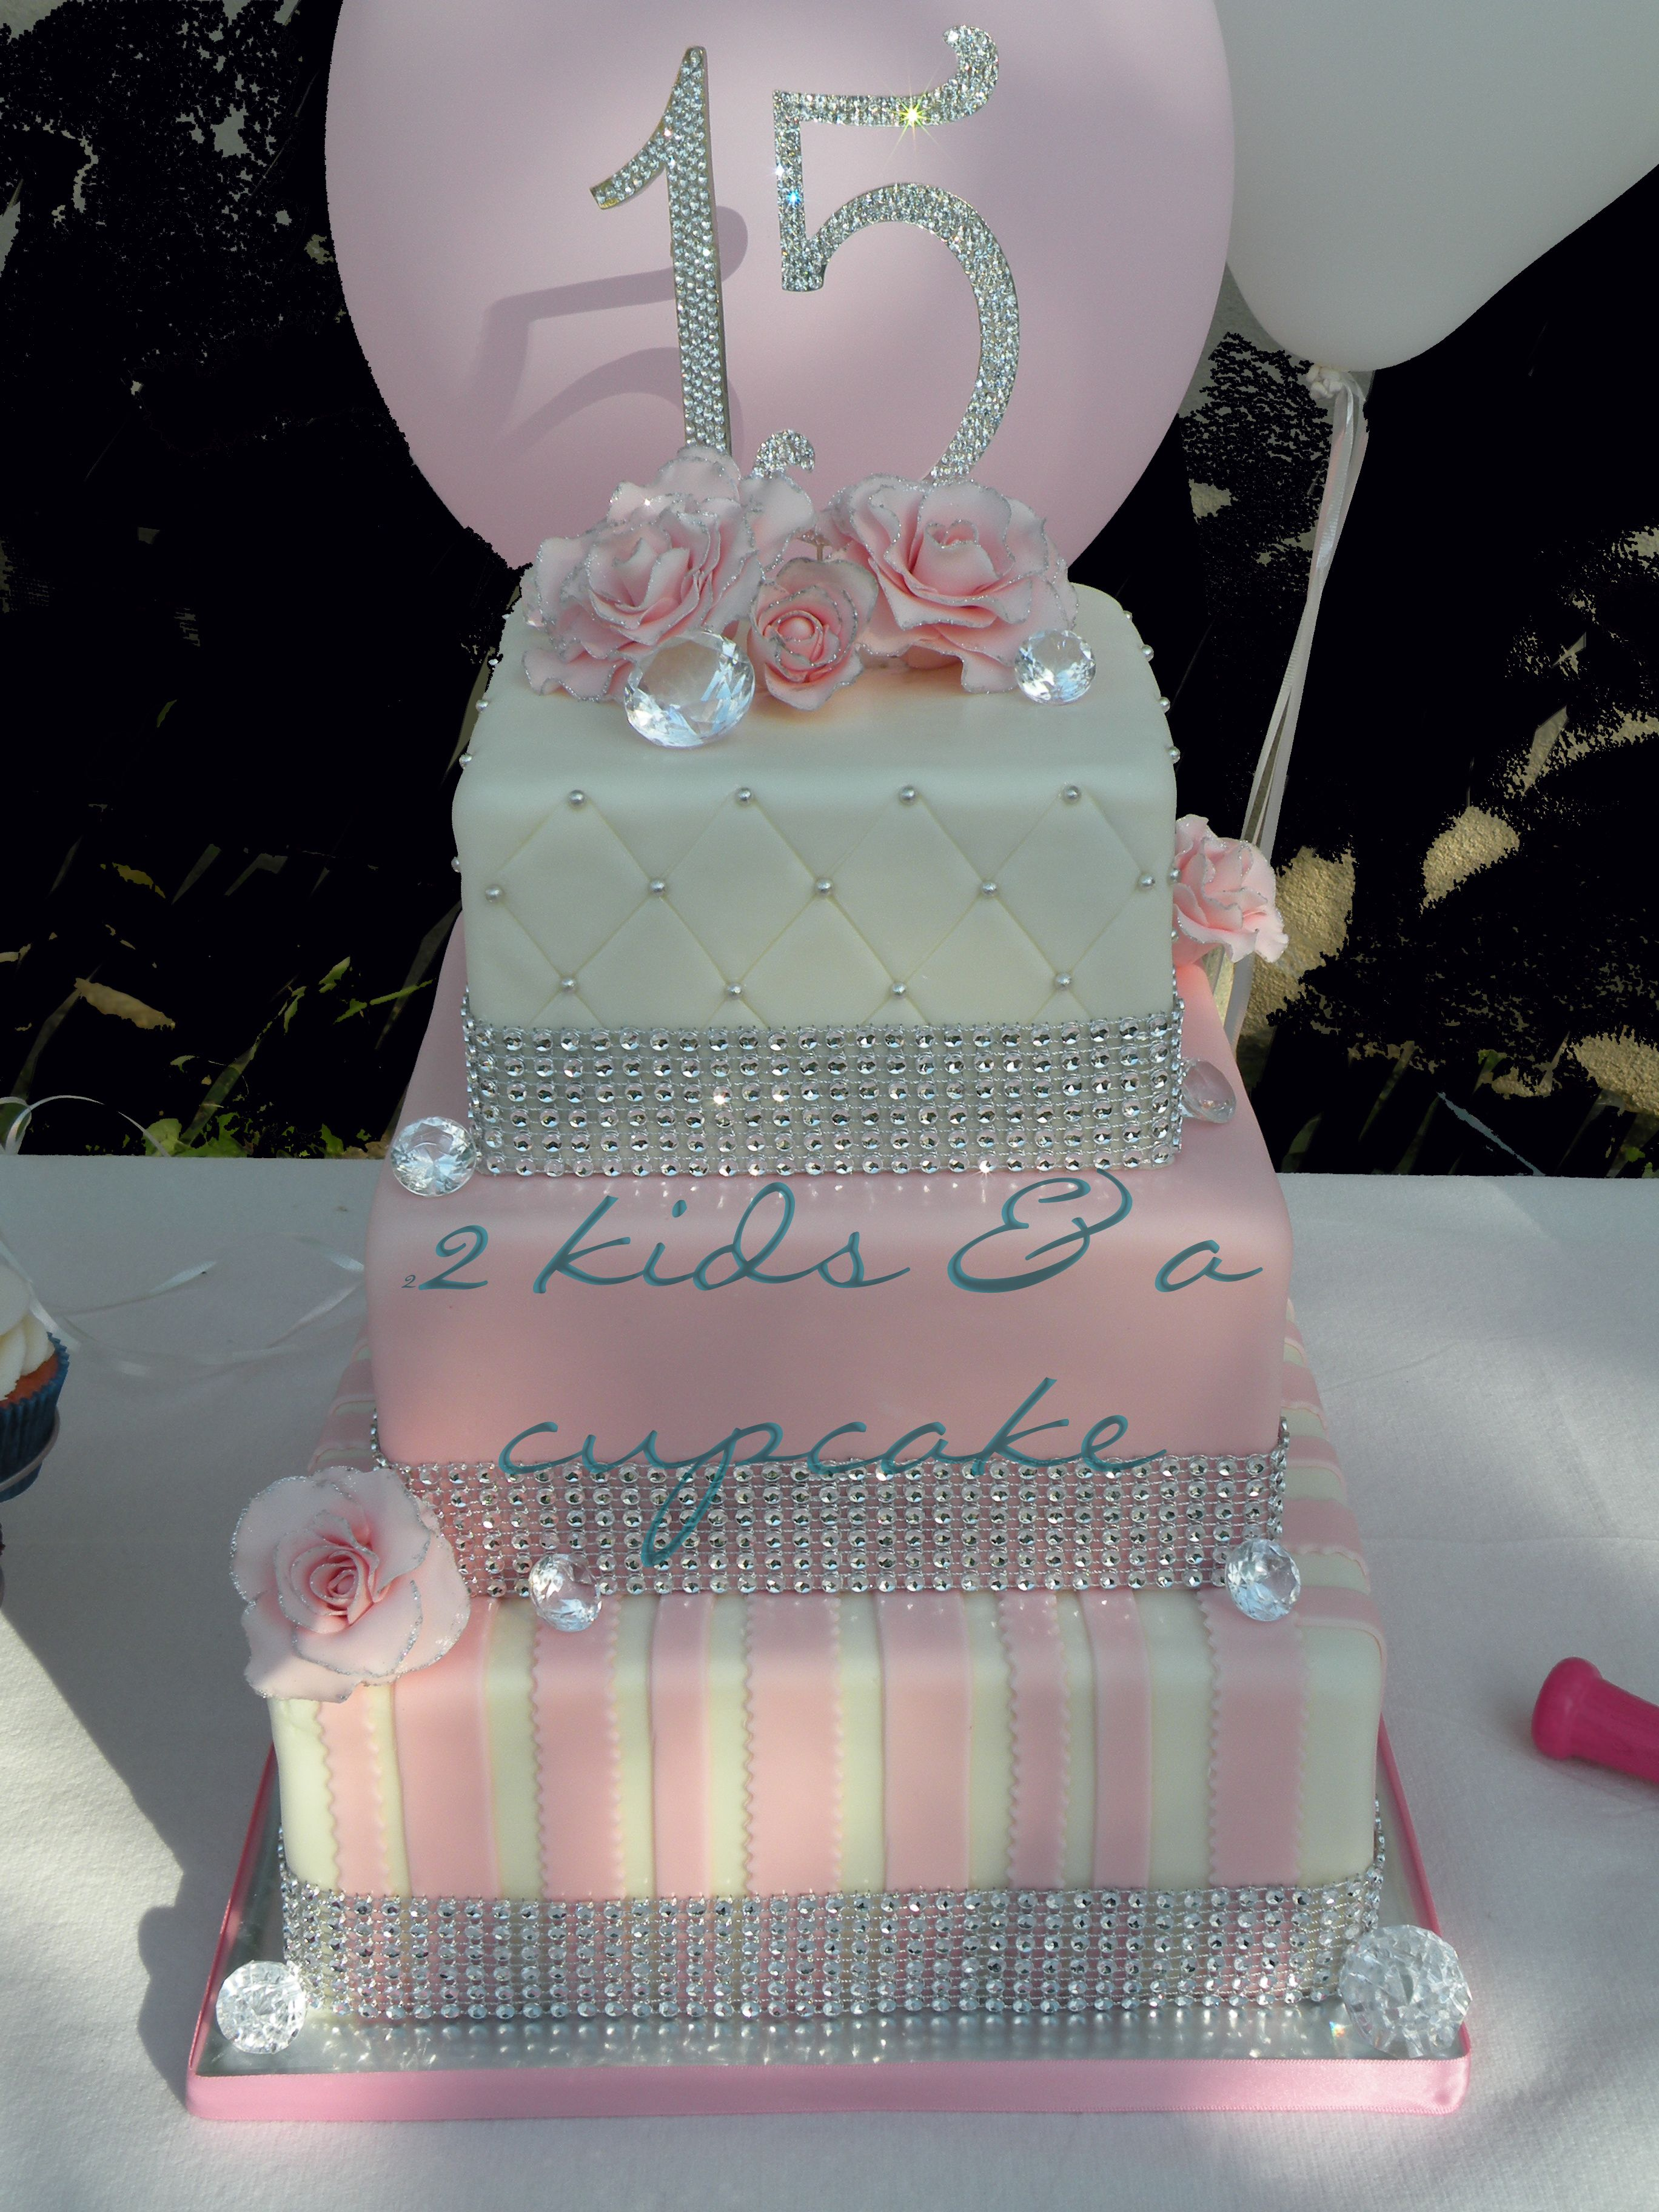 Paris decorations for quinceaneras - Quinceanera Cake Made This For A Friend Not My Original Design